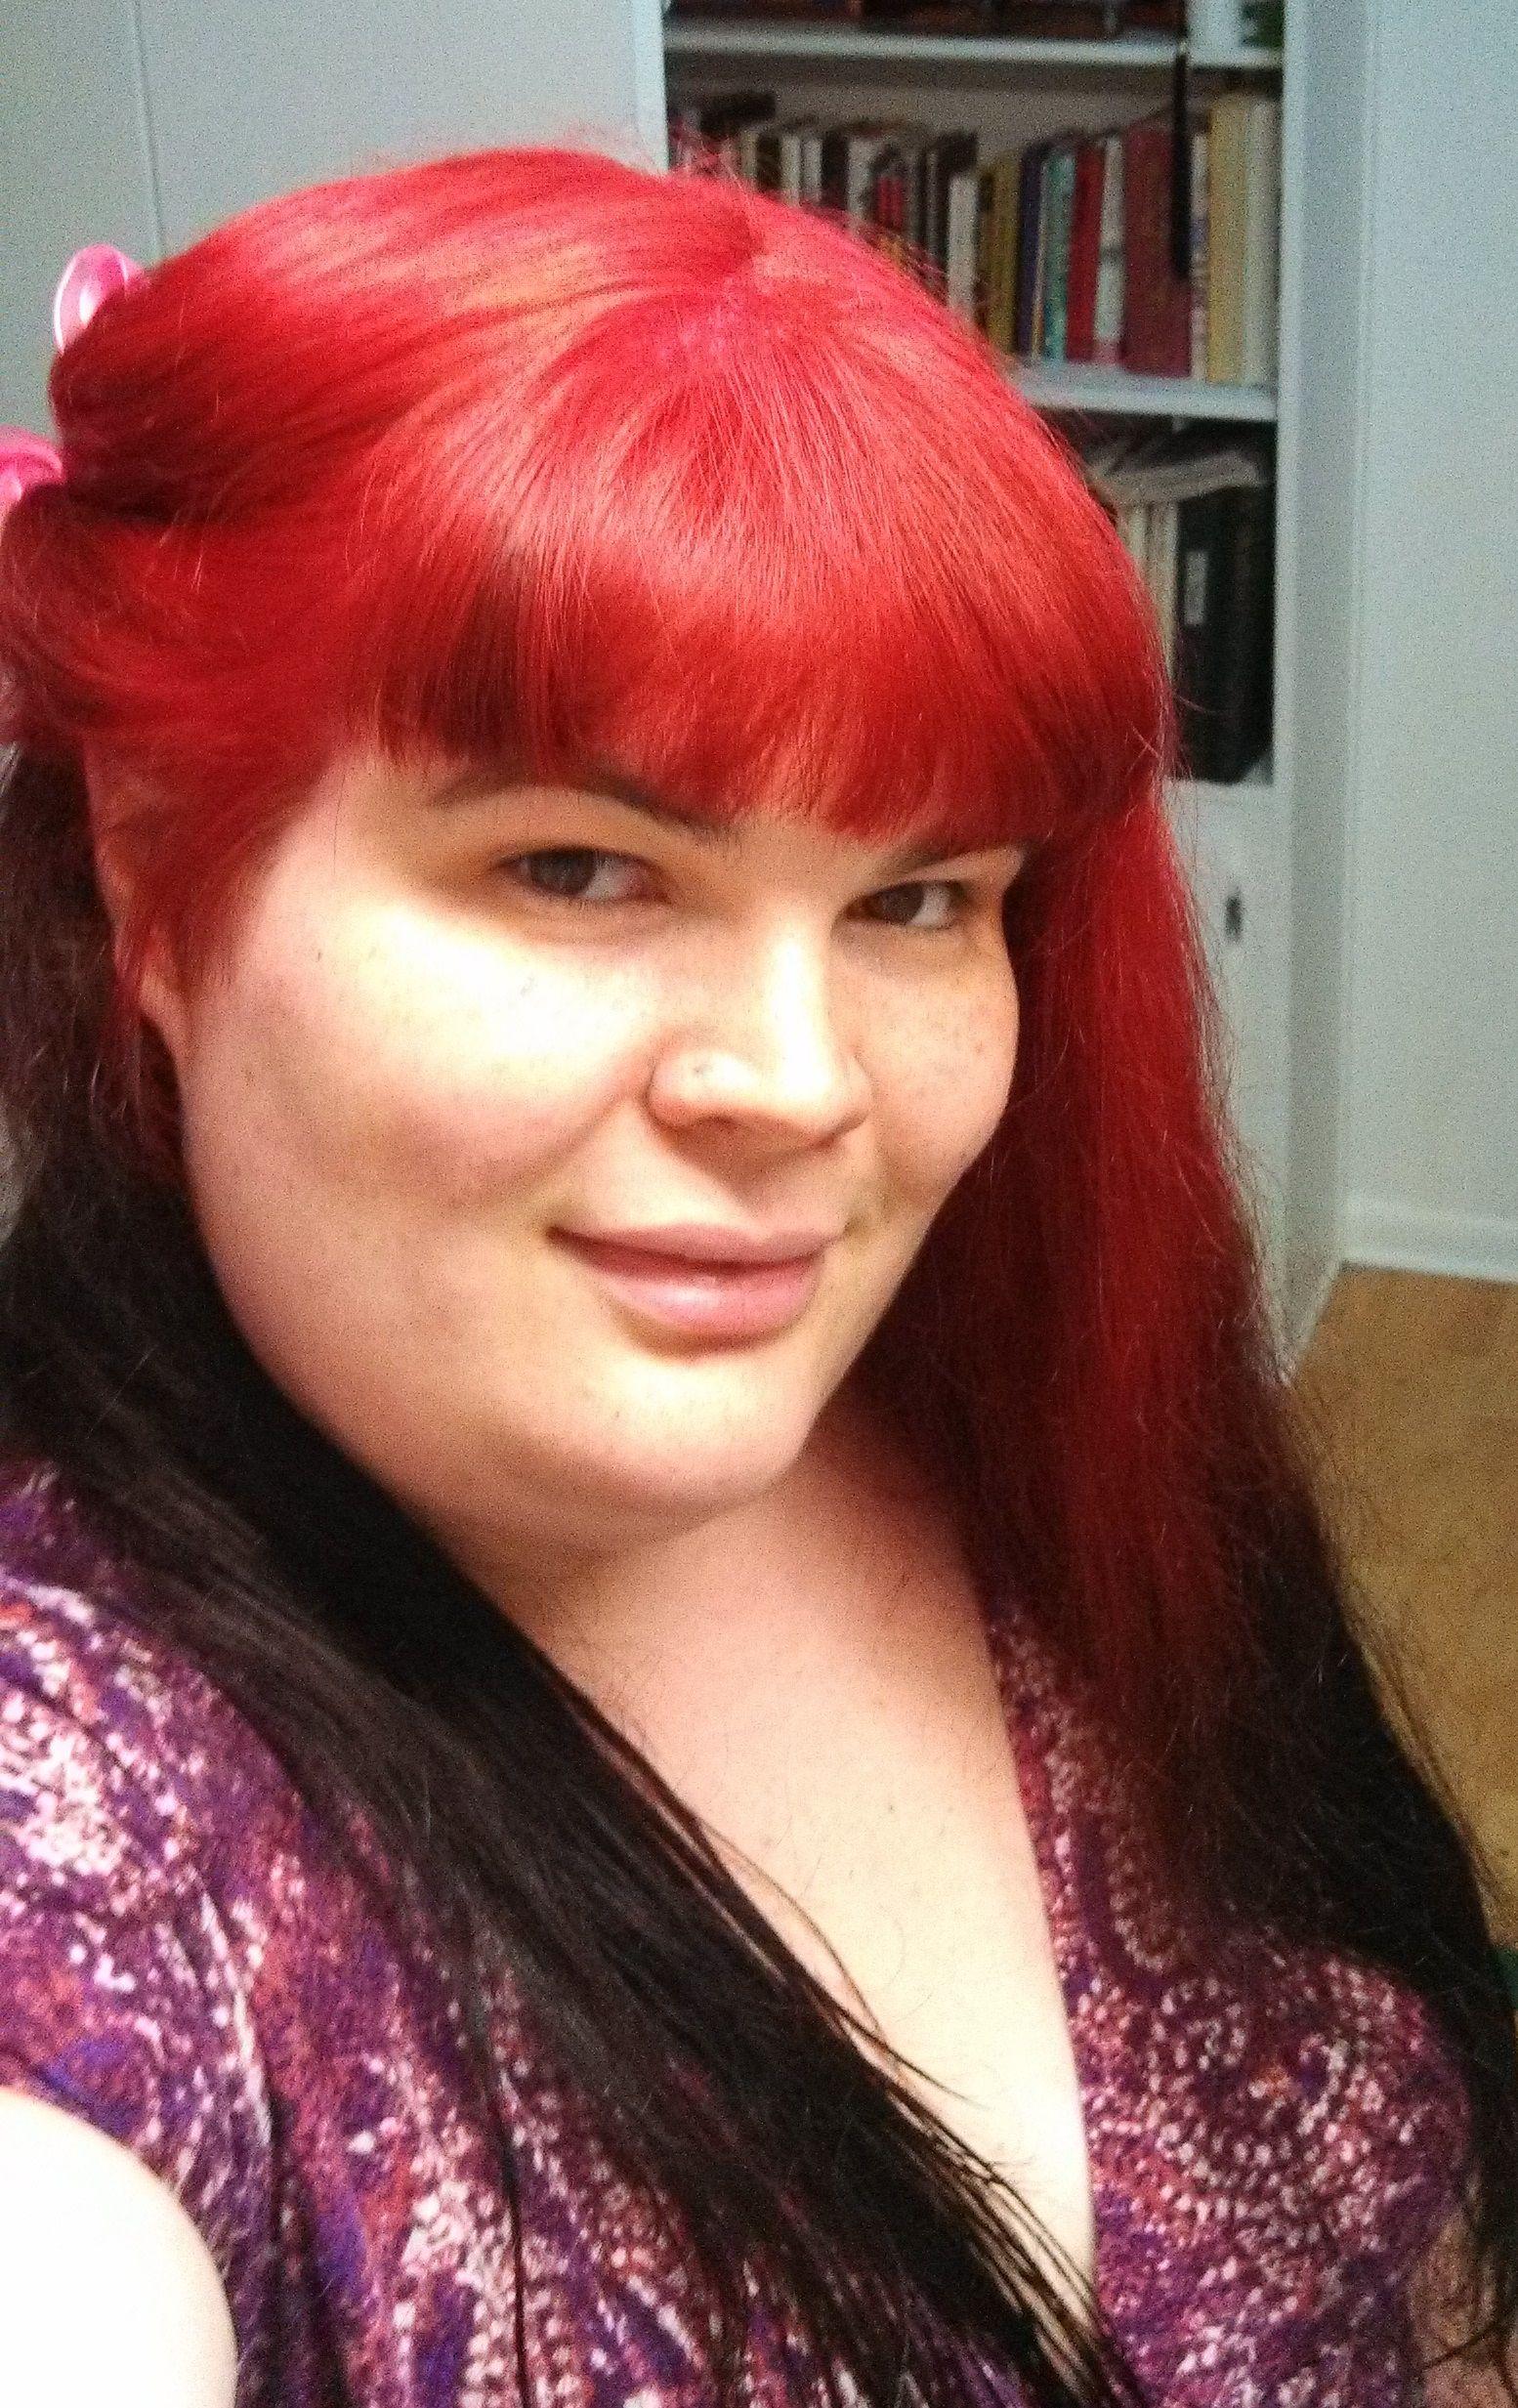 How To Dye Phoenix Fire Hair Red To Yellow Ombre Splat Hair Dye Hair Dye Tutorial Flame Hair